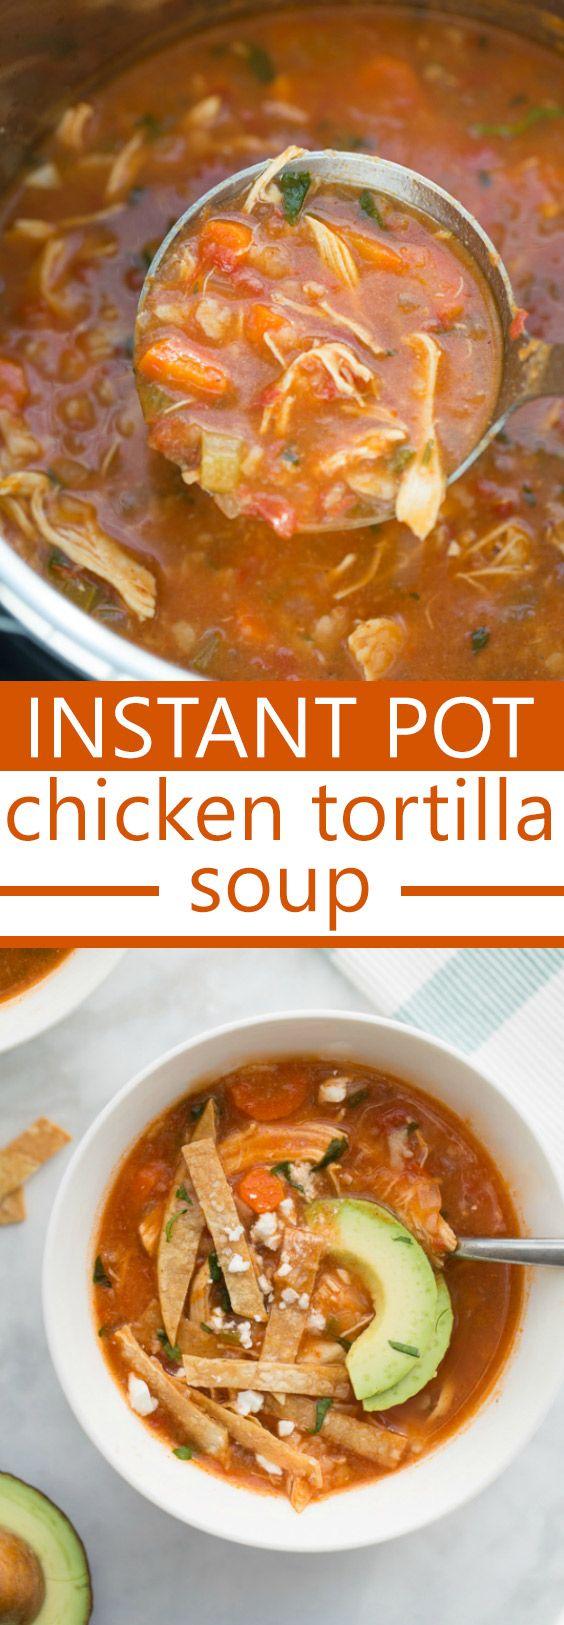 Instant Pot Chicken Tortilla Soup | Posted By: DebbieNet.com